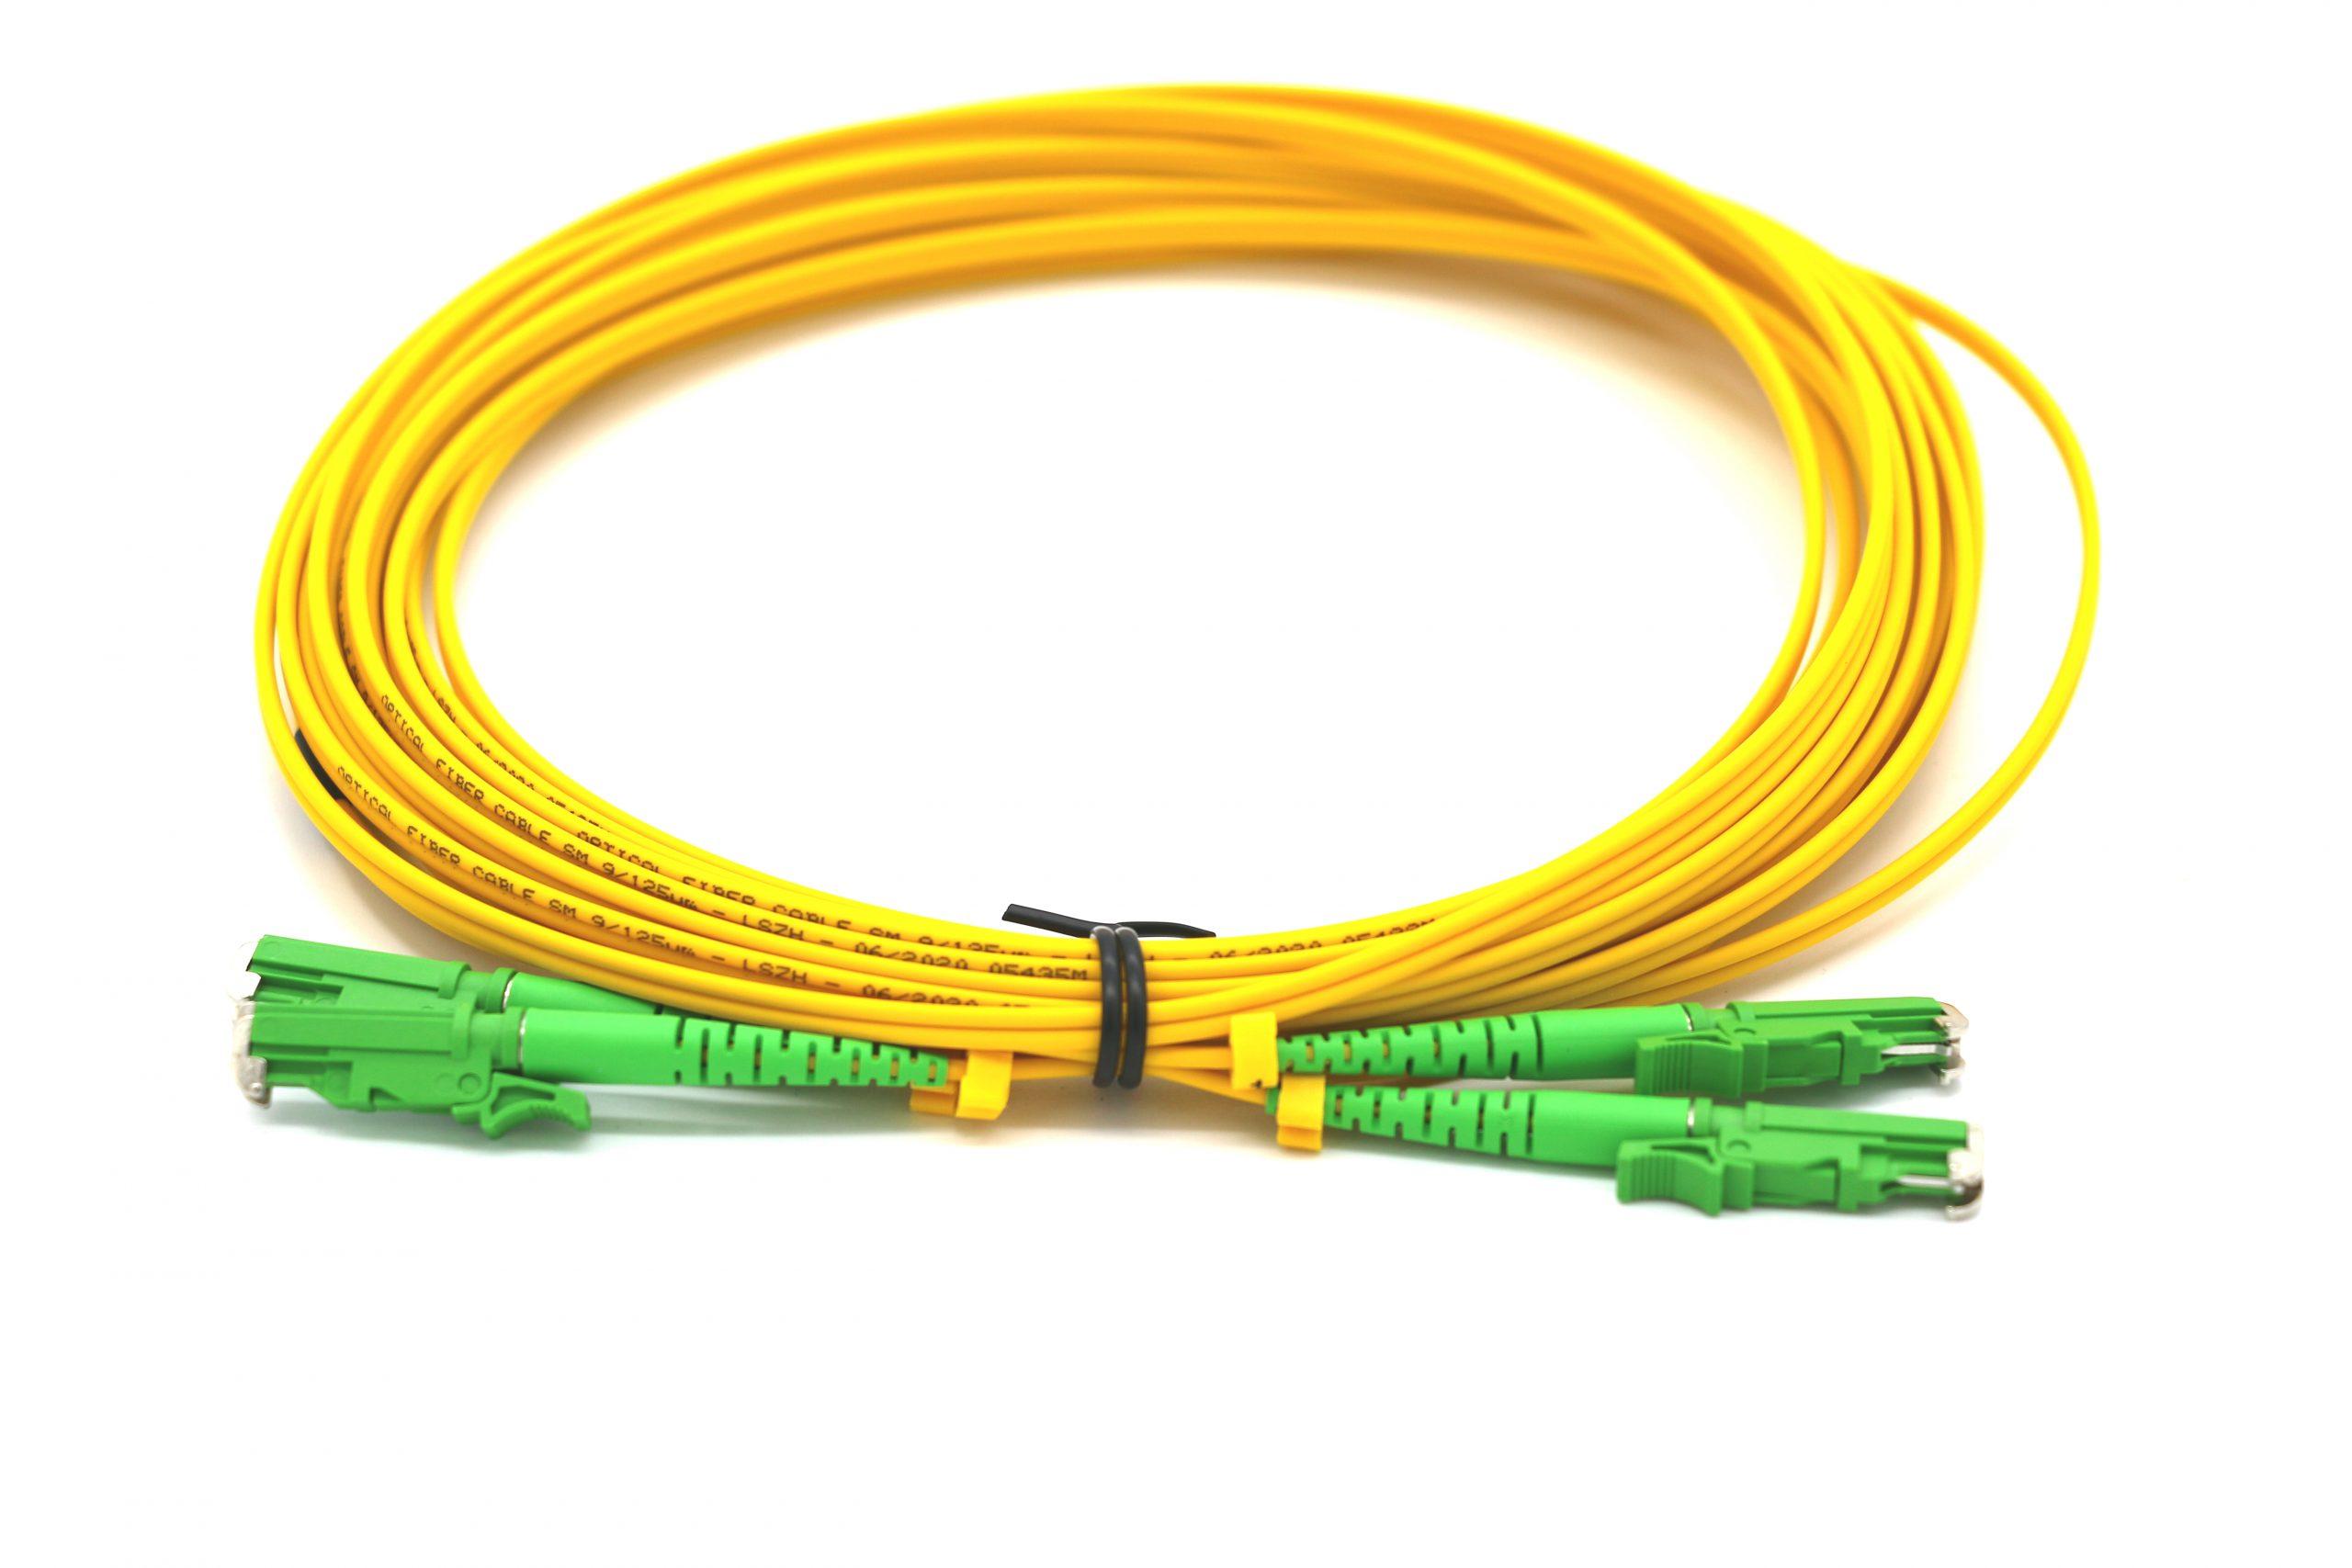 eLan E2000/APC-E2000/APC duplex patch cord OS2 10m